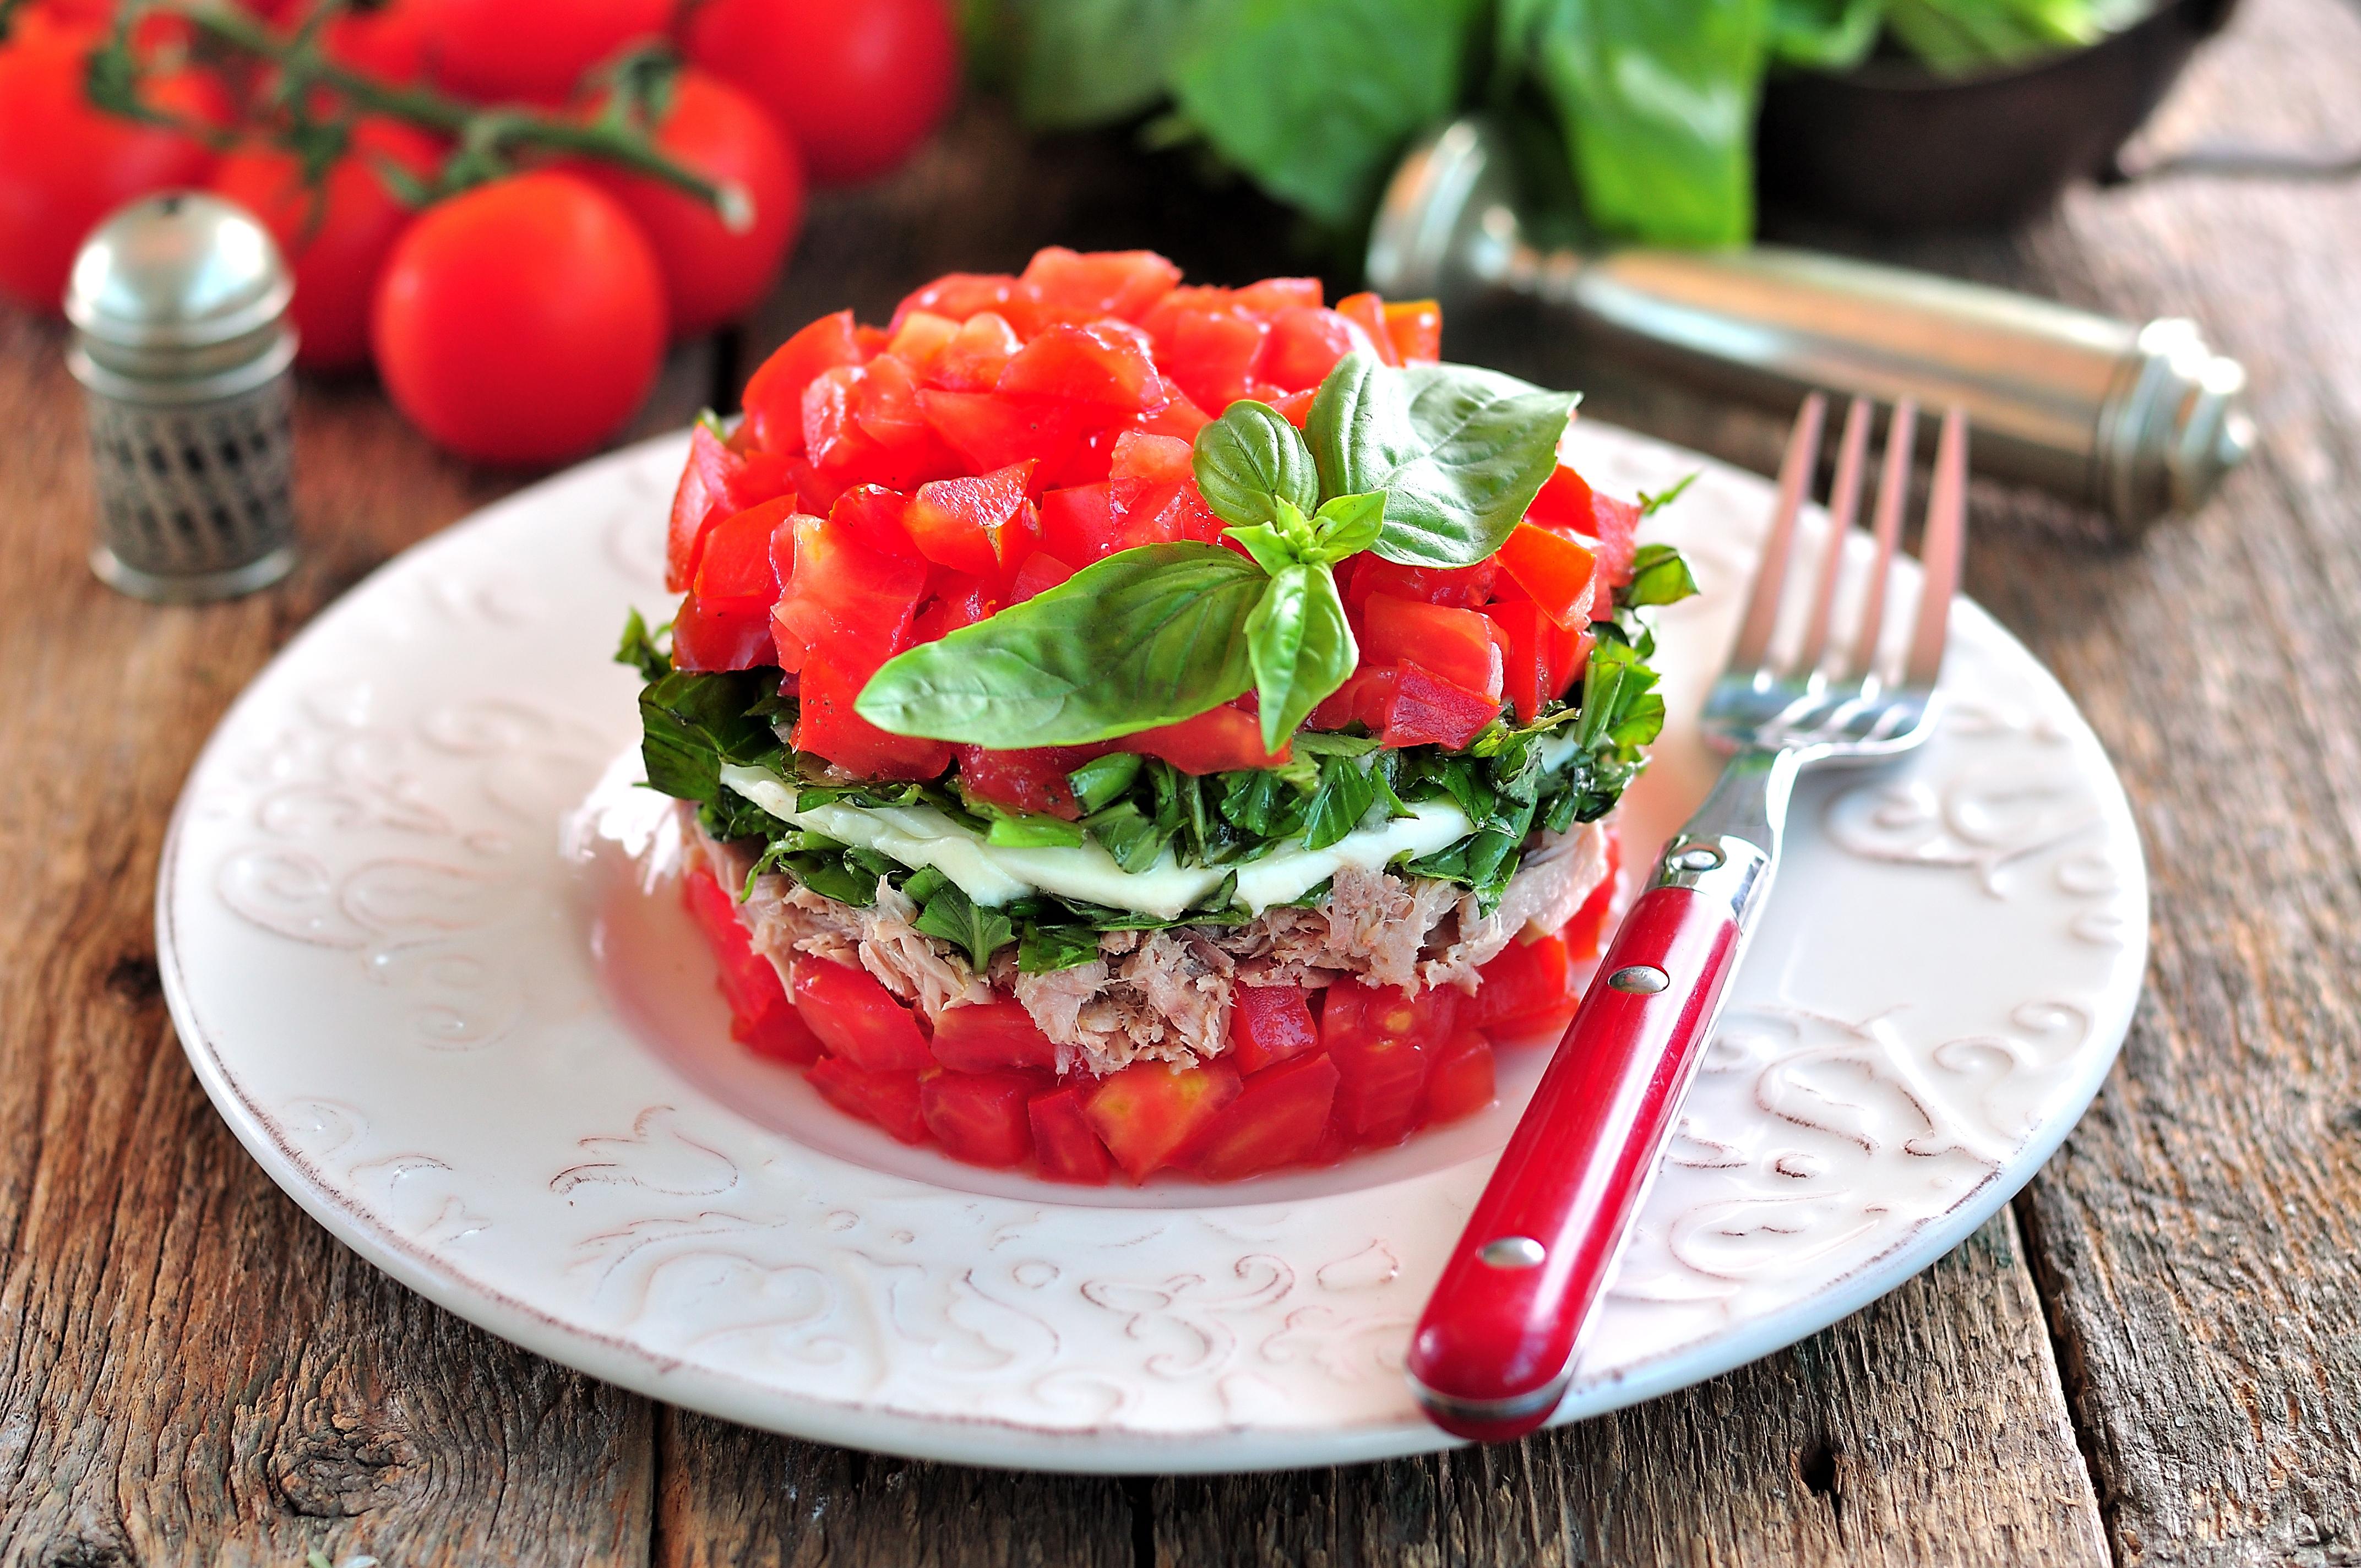 Салат с тунцом, моцареллой, помидорами и базиликом